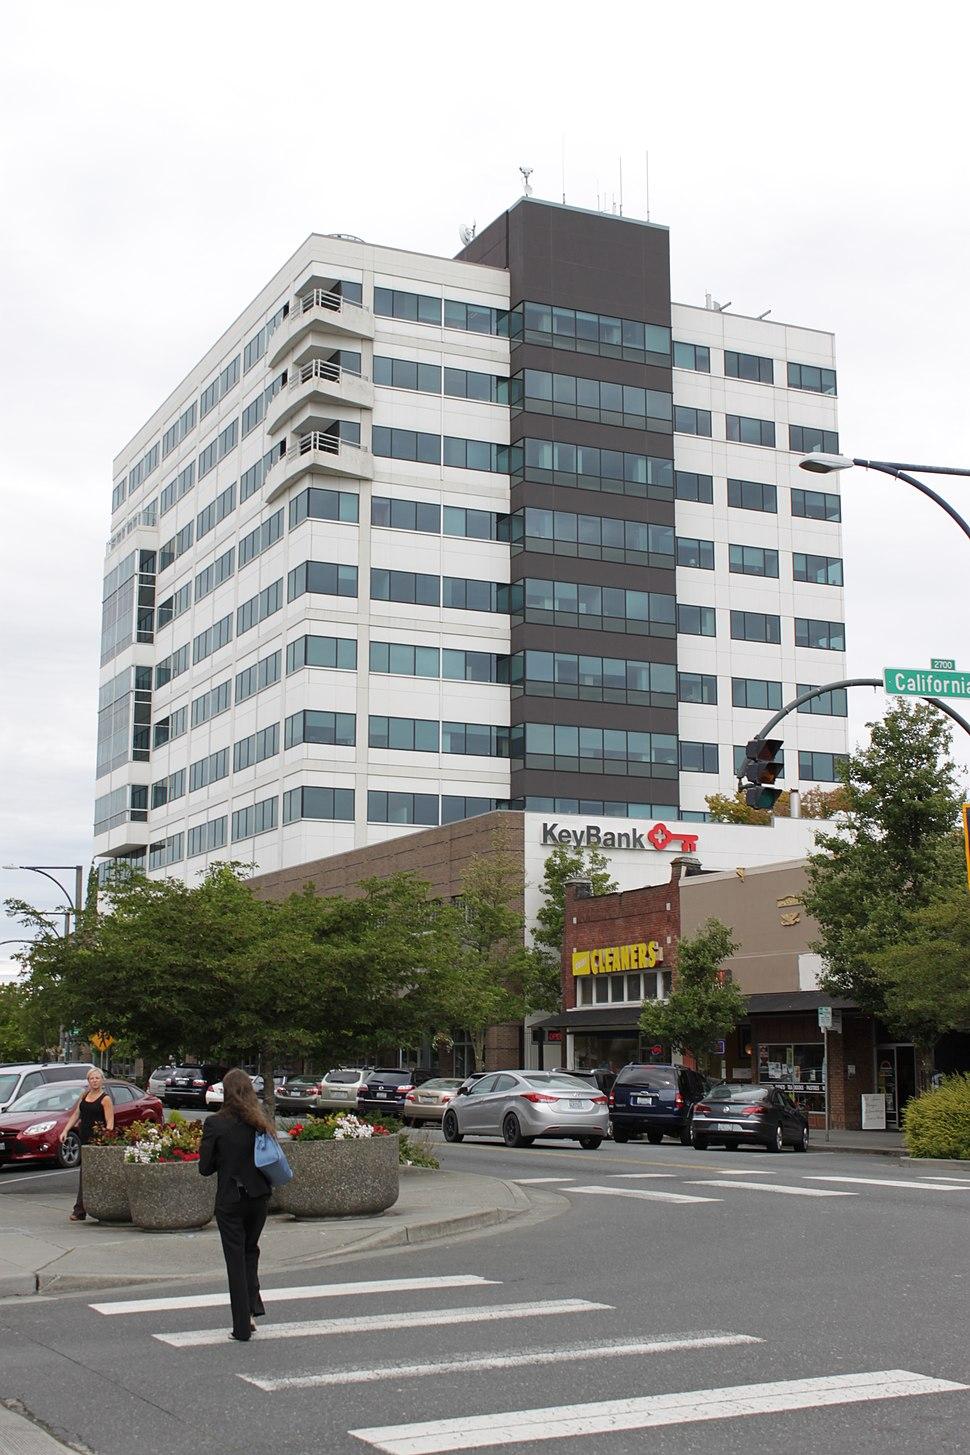 Everett Mutual Tower (18345199053)